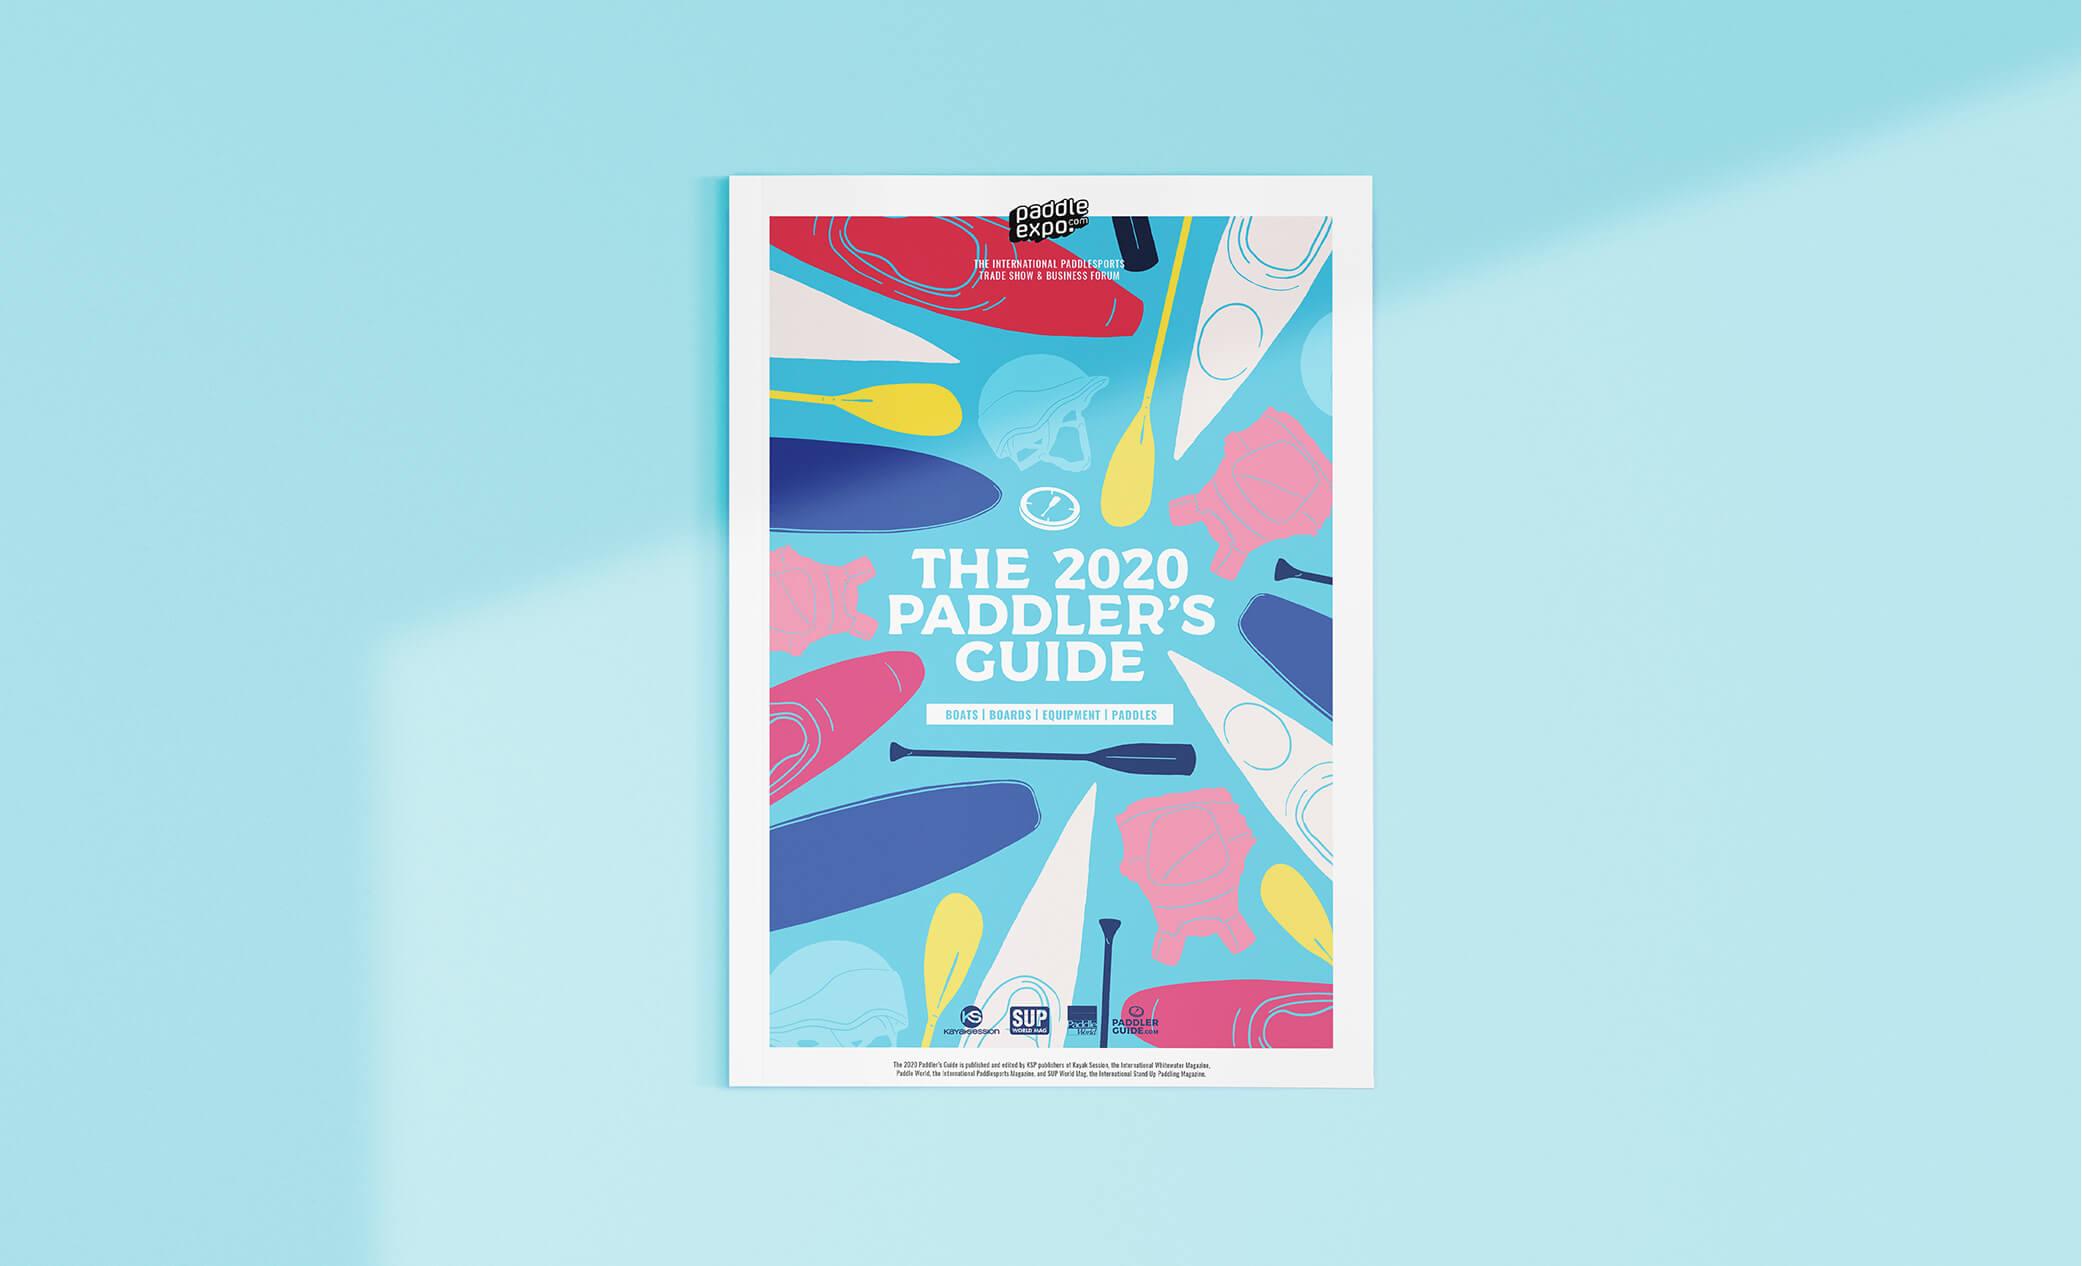 couverture du paddler's guide 2020